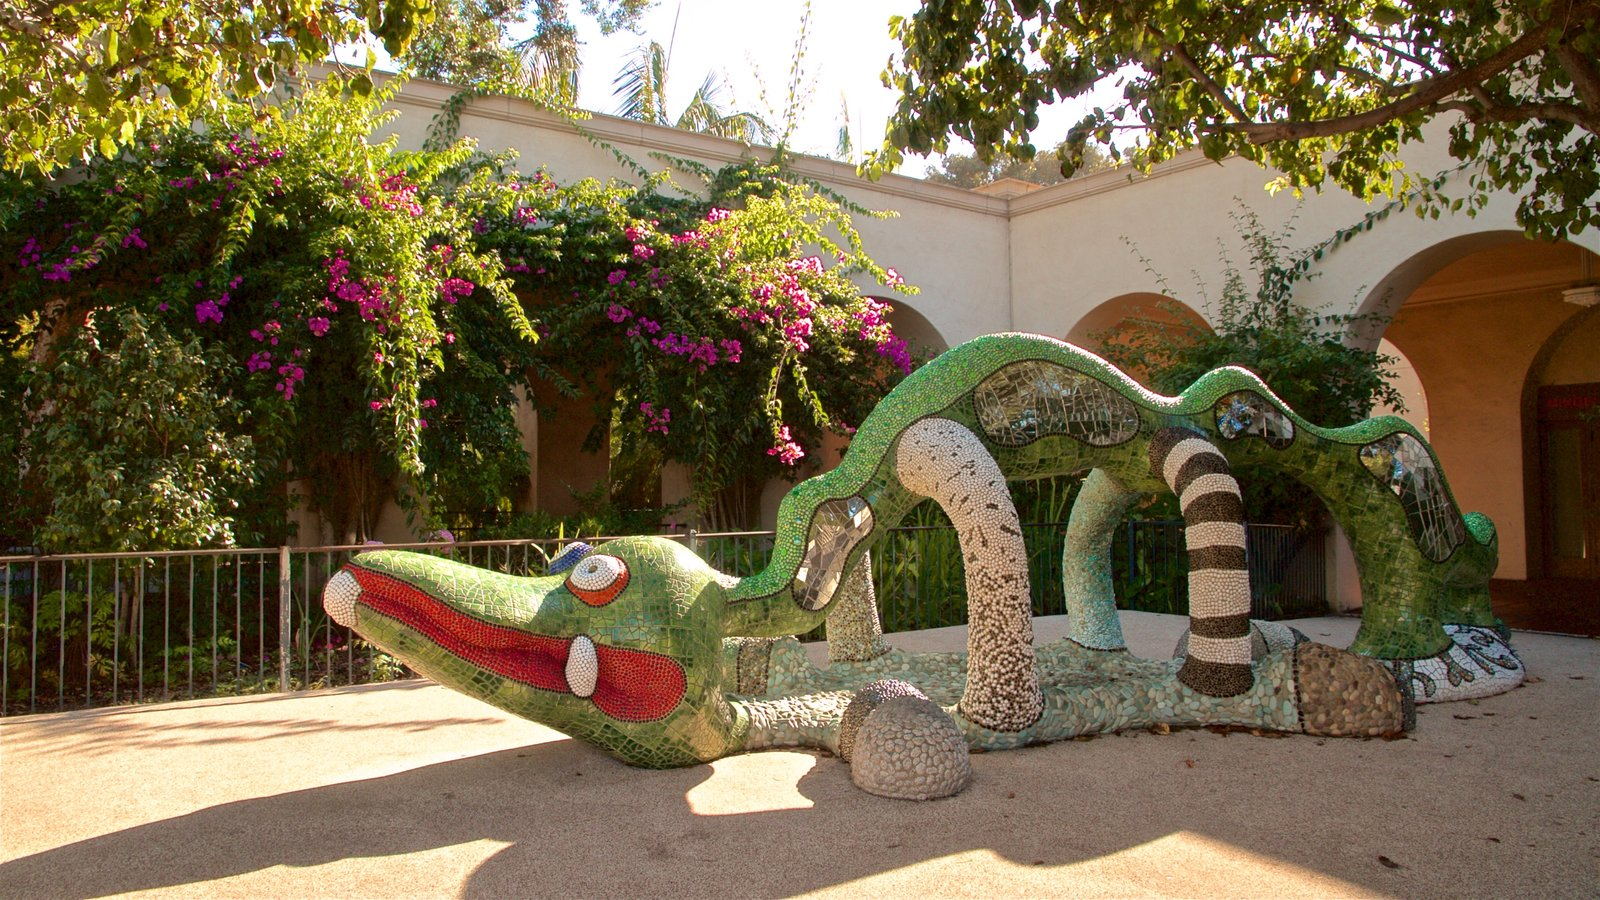 Alcazar Garden que inclui arte ao ar livre